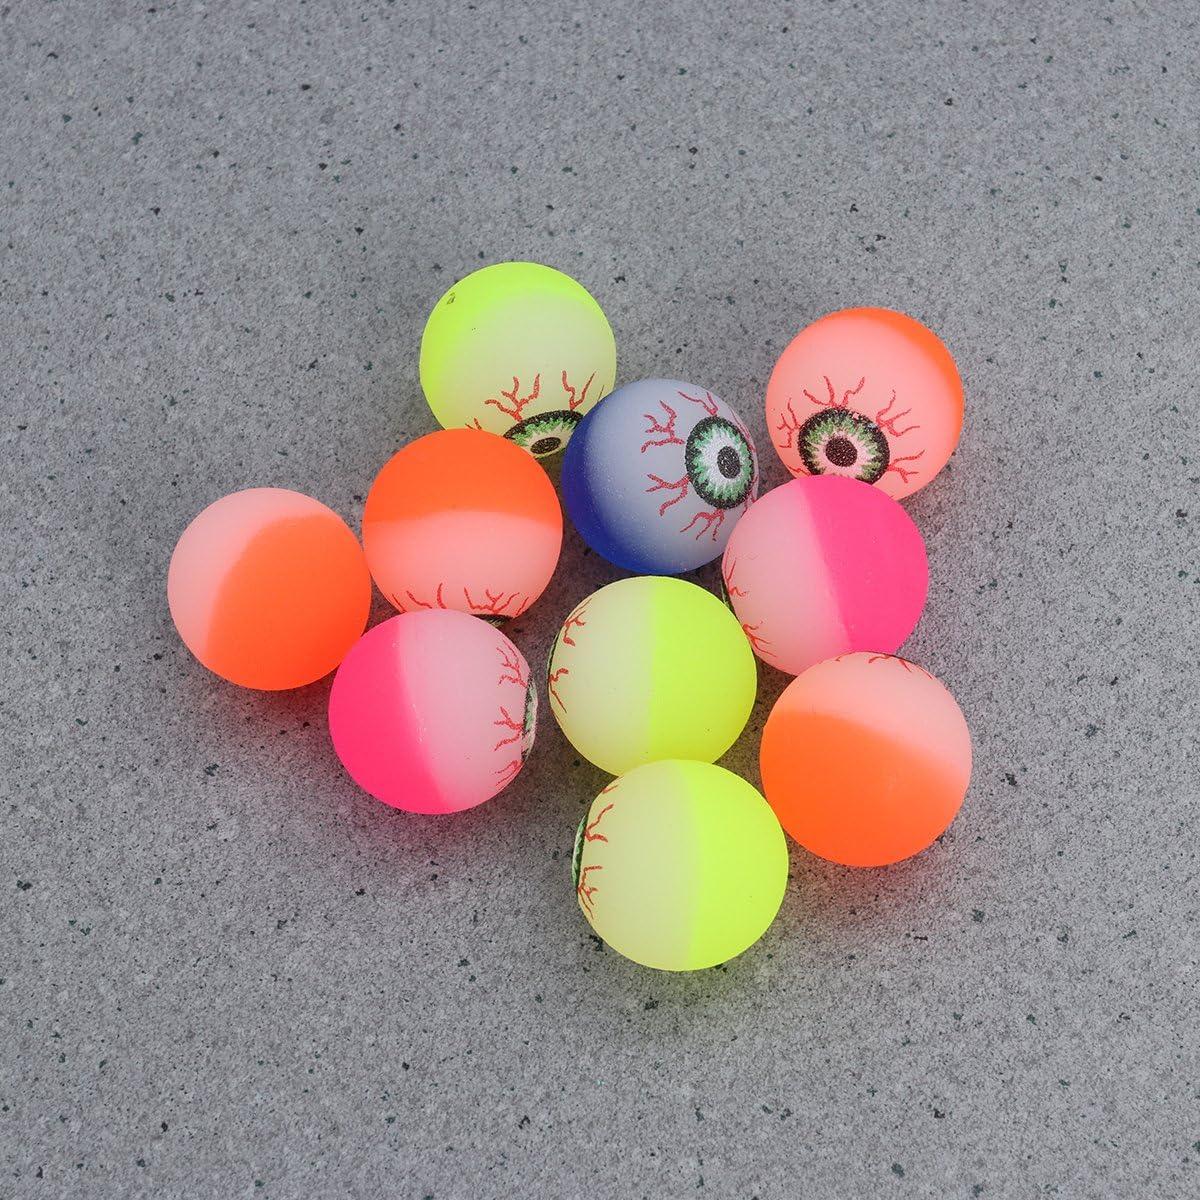 Halloween Bouncy Balls Eyeballs Scary Prank Halloween Party Supplies Halloween Party Themes, 30PCS